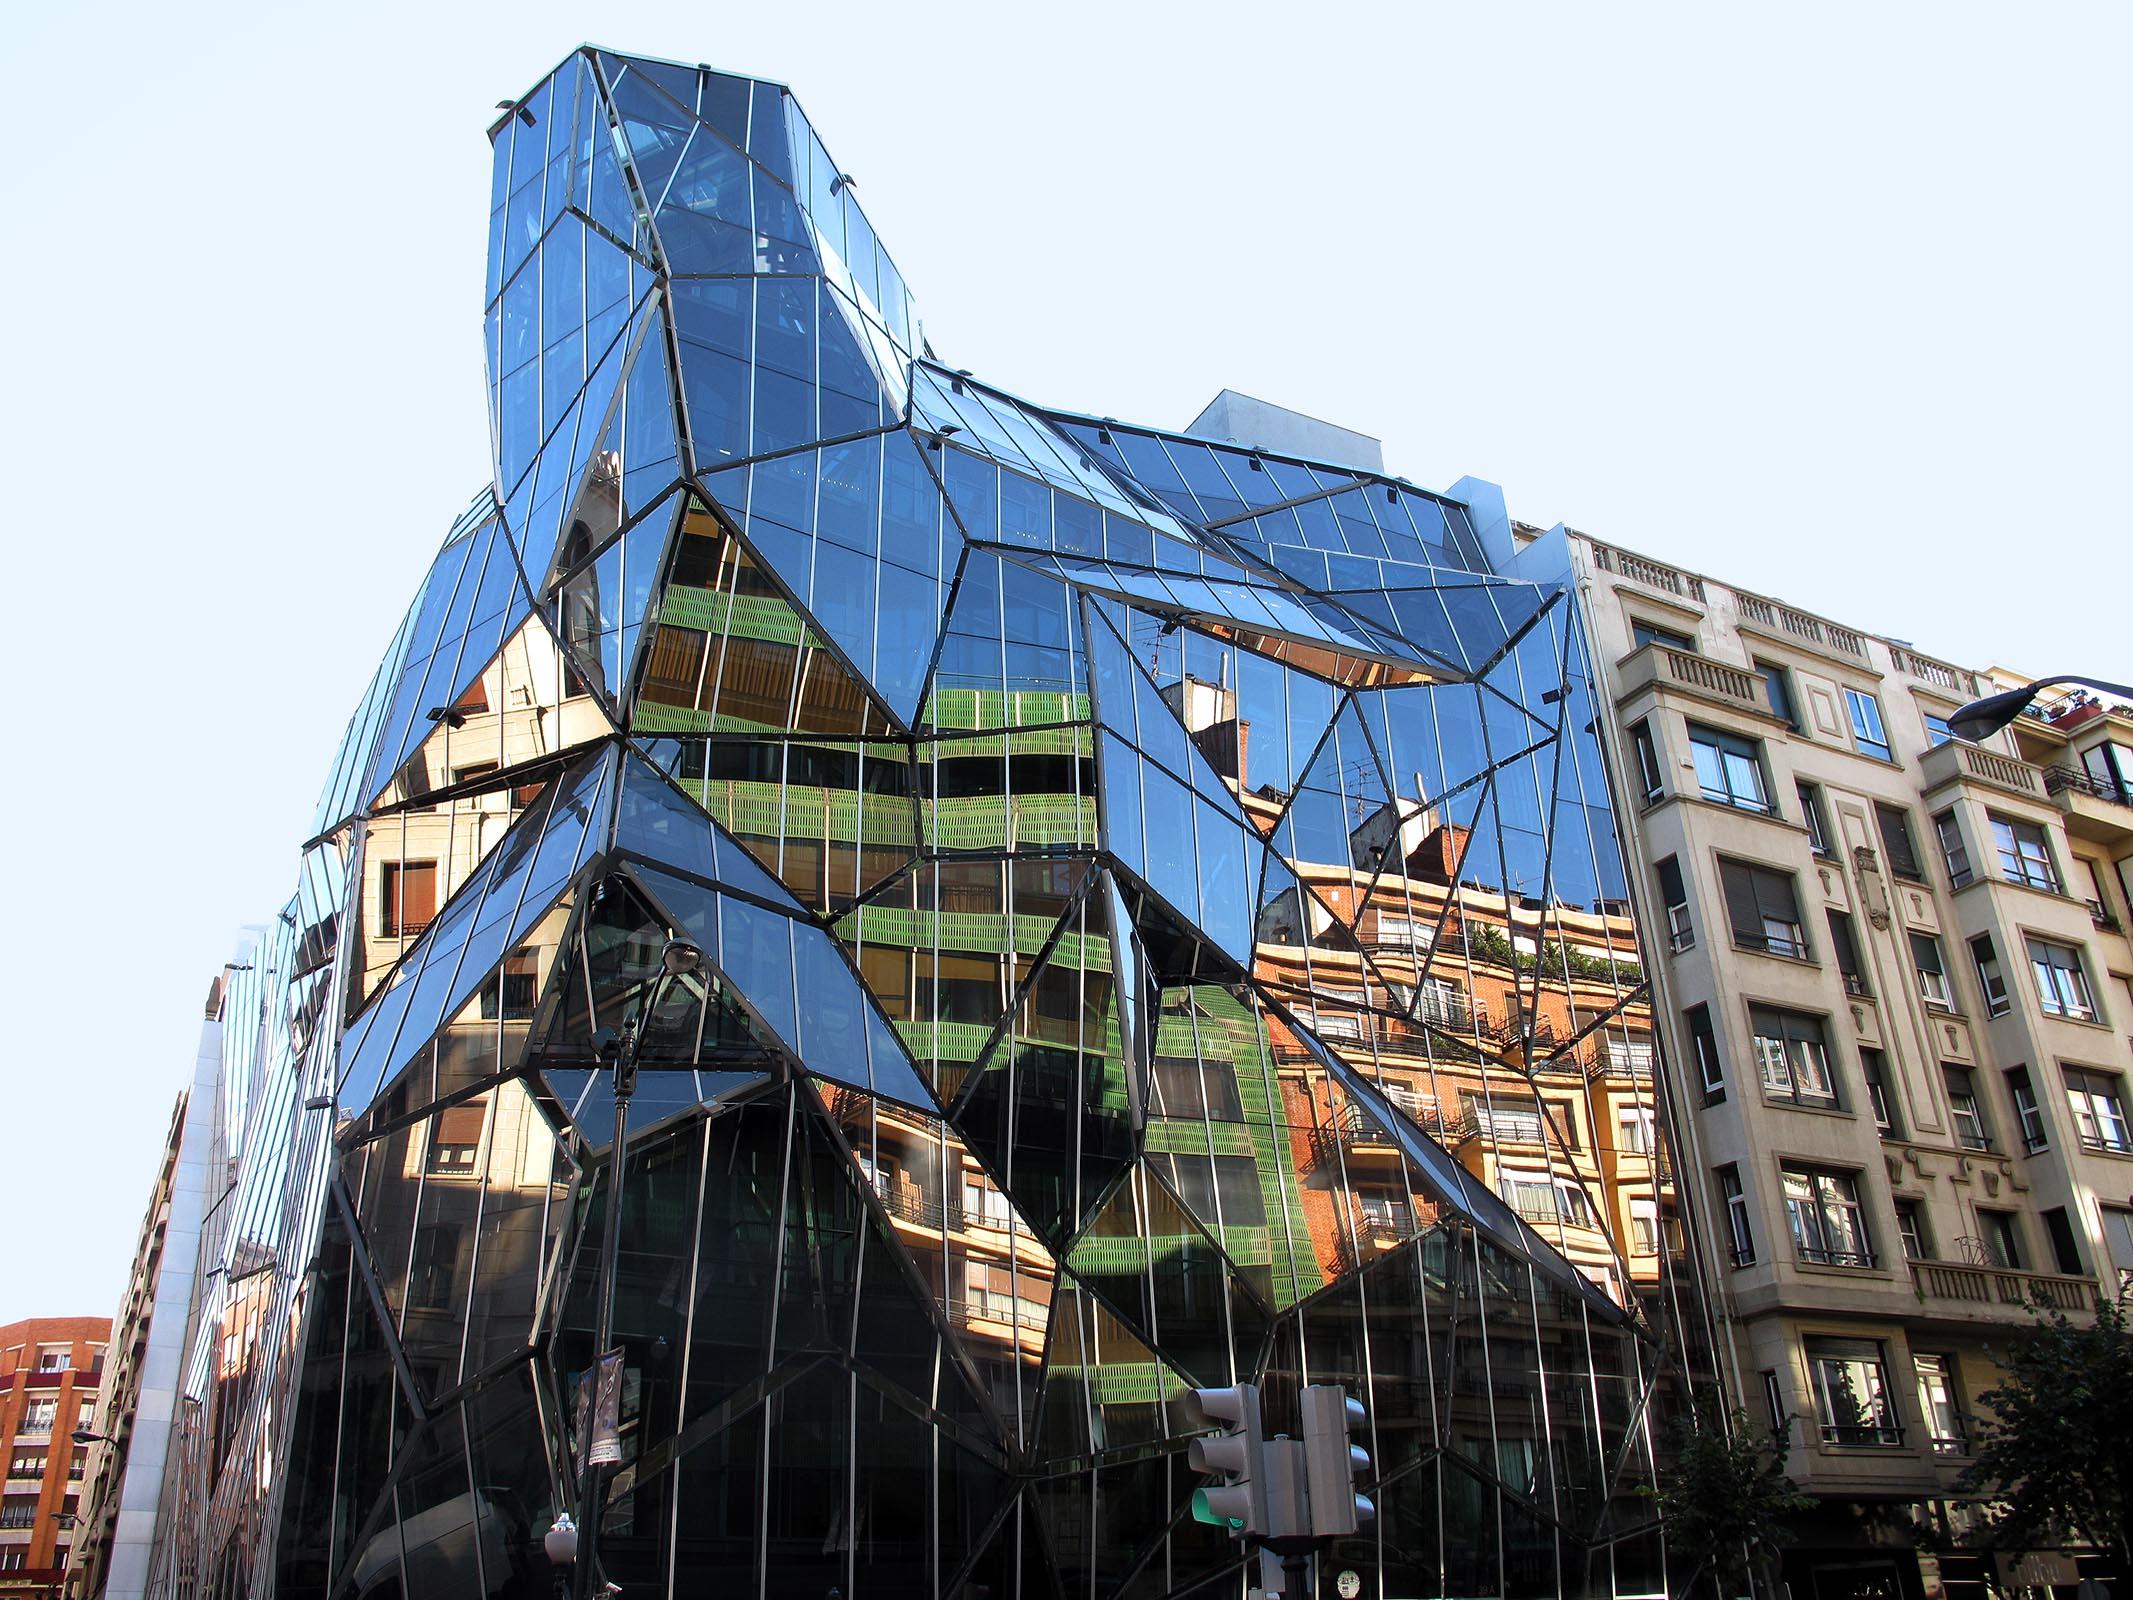 Malentendido 1 Bilbao